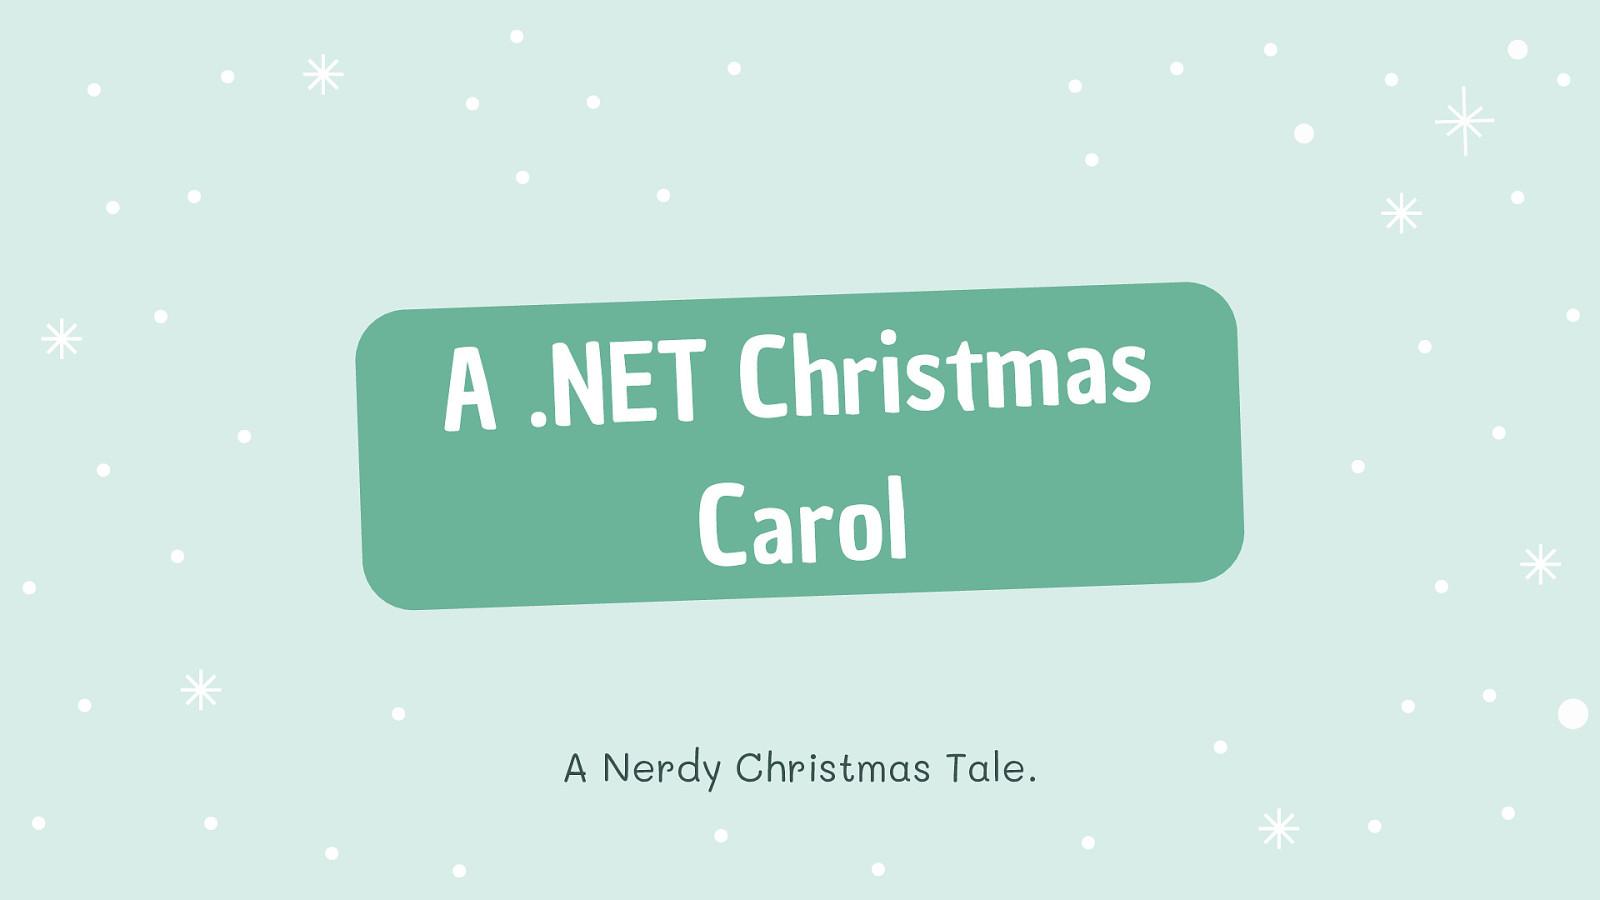 A .NET Christmas Carol